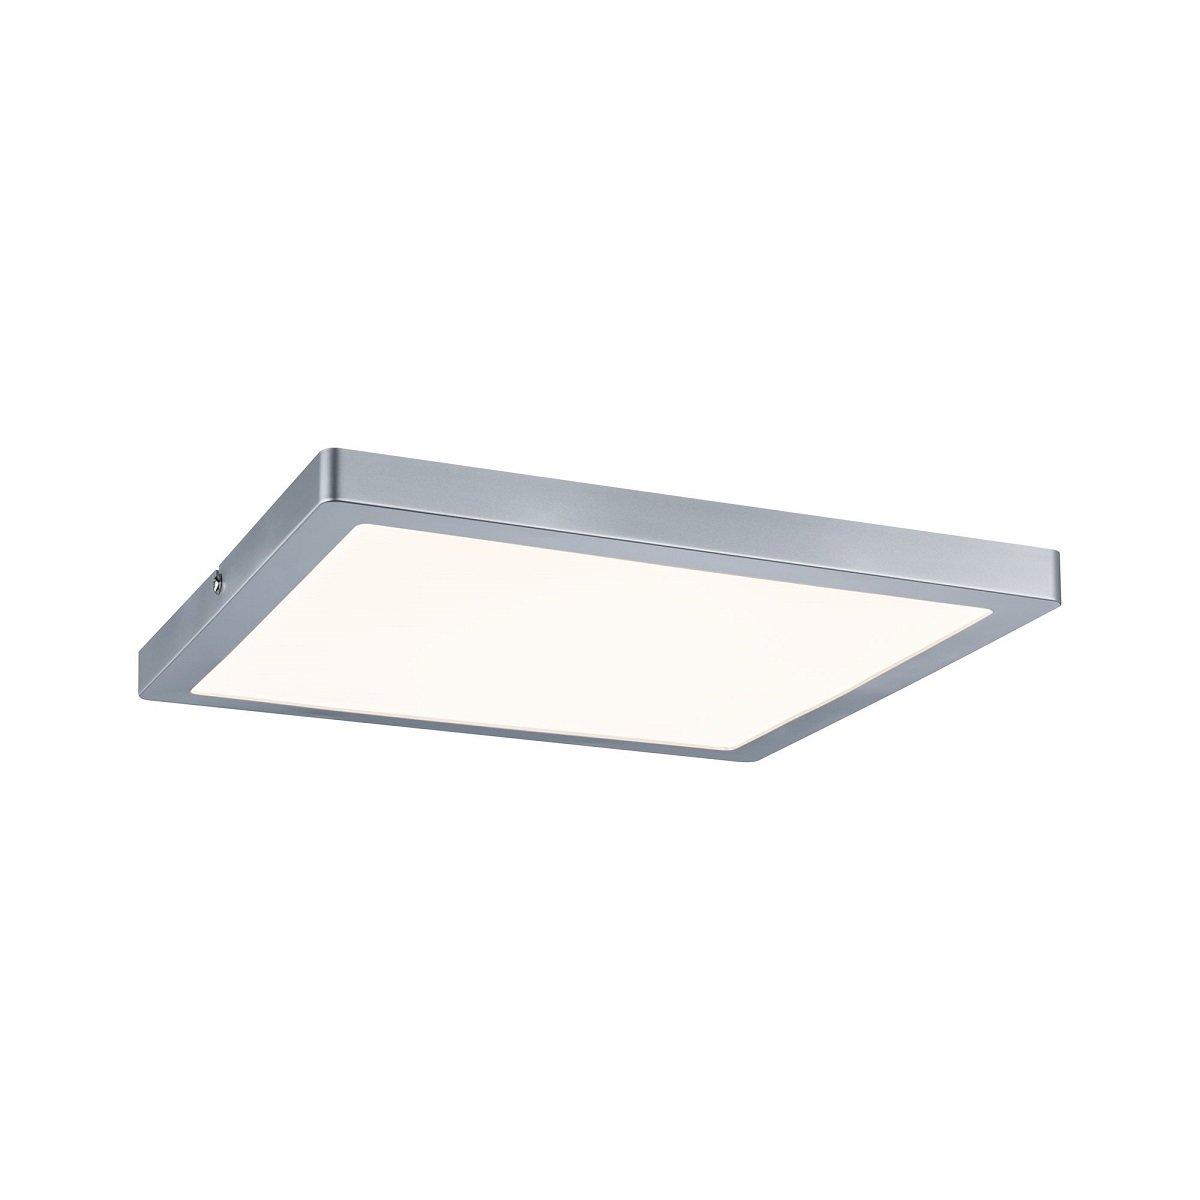 paulmann no 70867 led panel atria eckig 24w chrom matt dimmbar eur 38 49 leuchten lampen. Black Bedroom Furniture Sets. Home Design Ideas